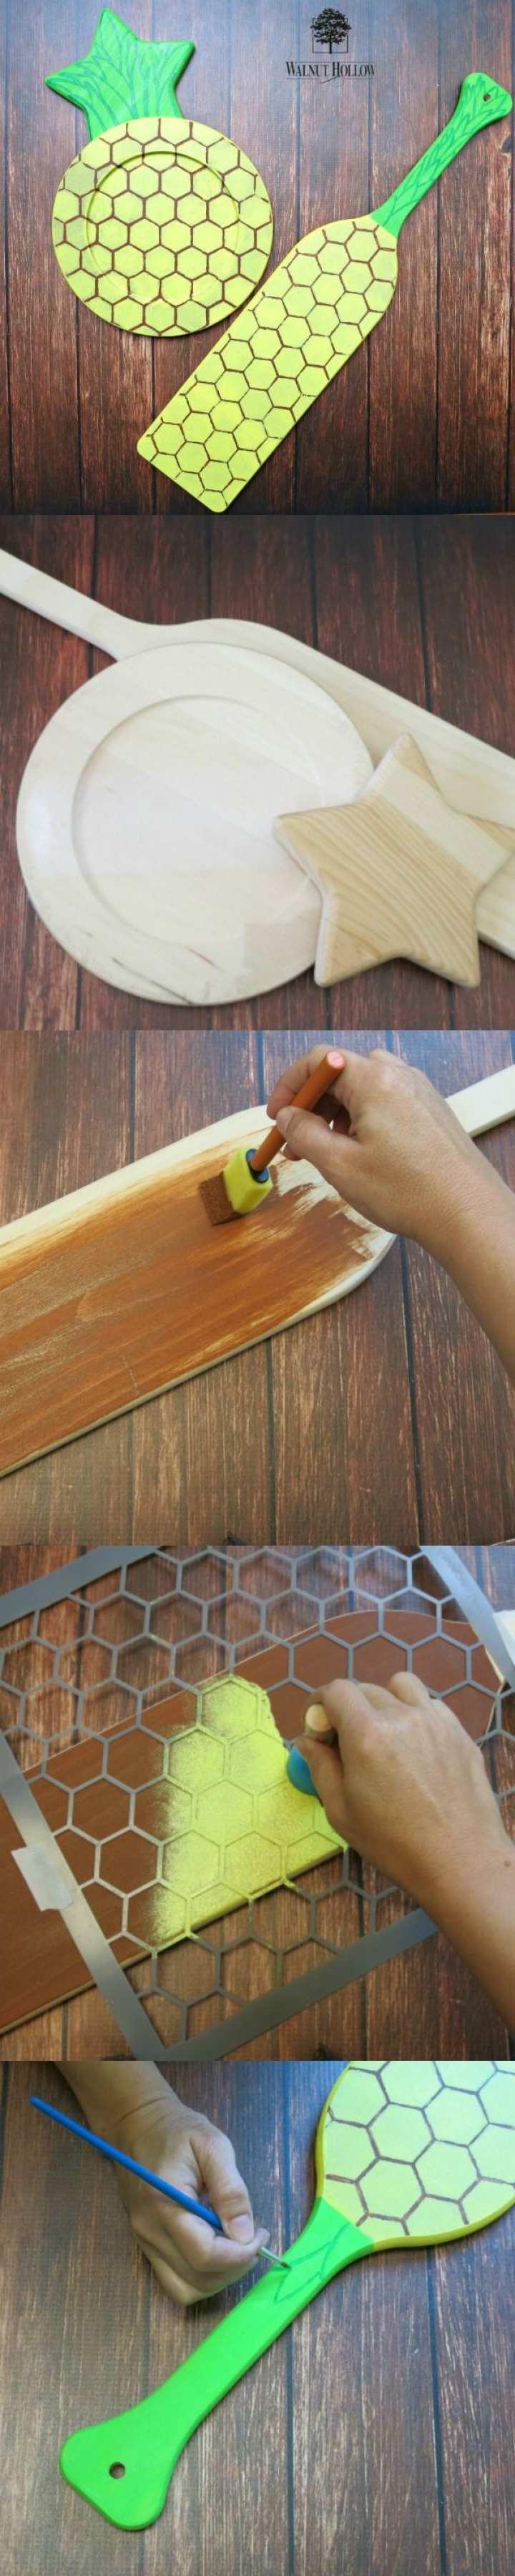 hardwood floor estimate of outdoor wood flooring beautiful white vinyl fencing material prices in outdoor wood flooring awesome 106 besten diy a¢ outdoor dining bilder auf pinterest of